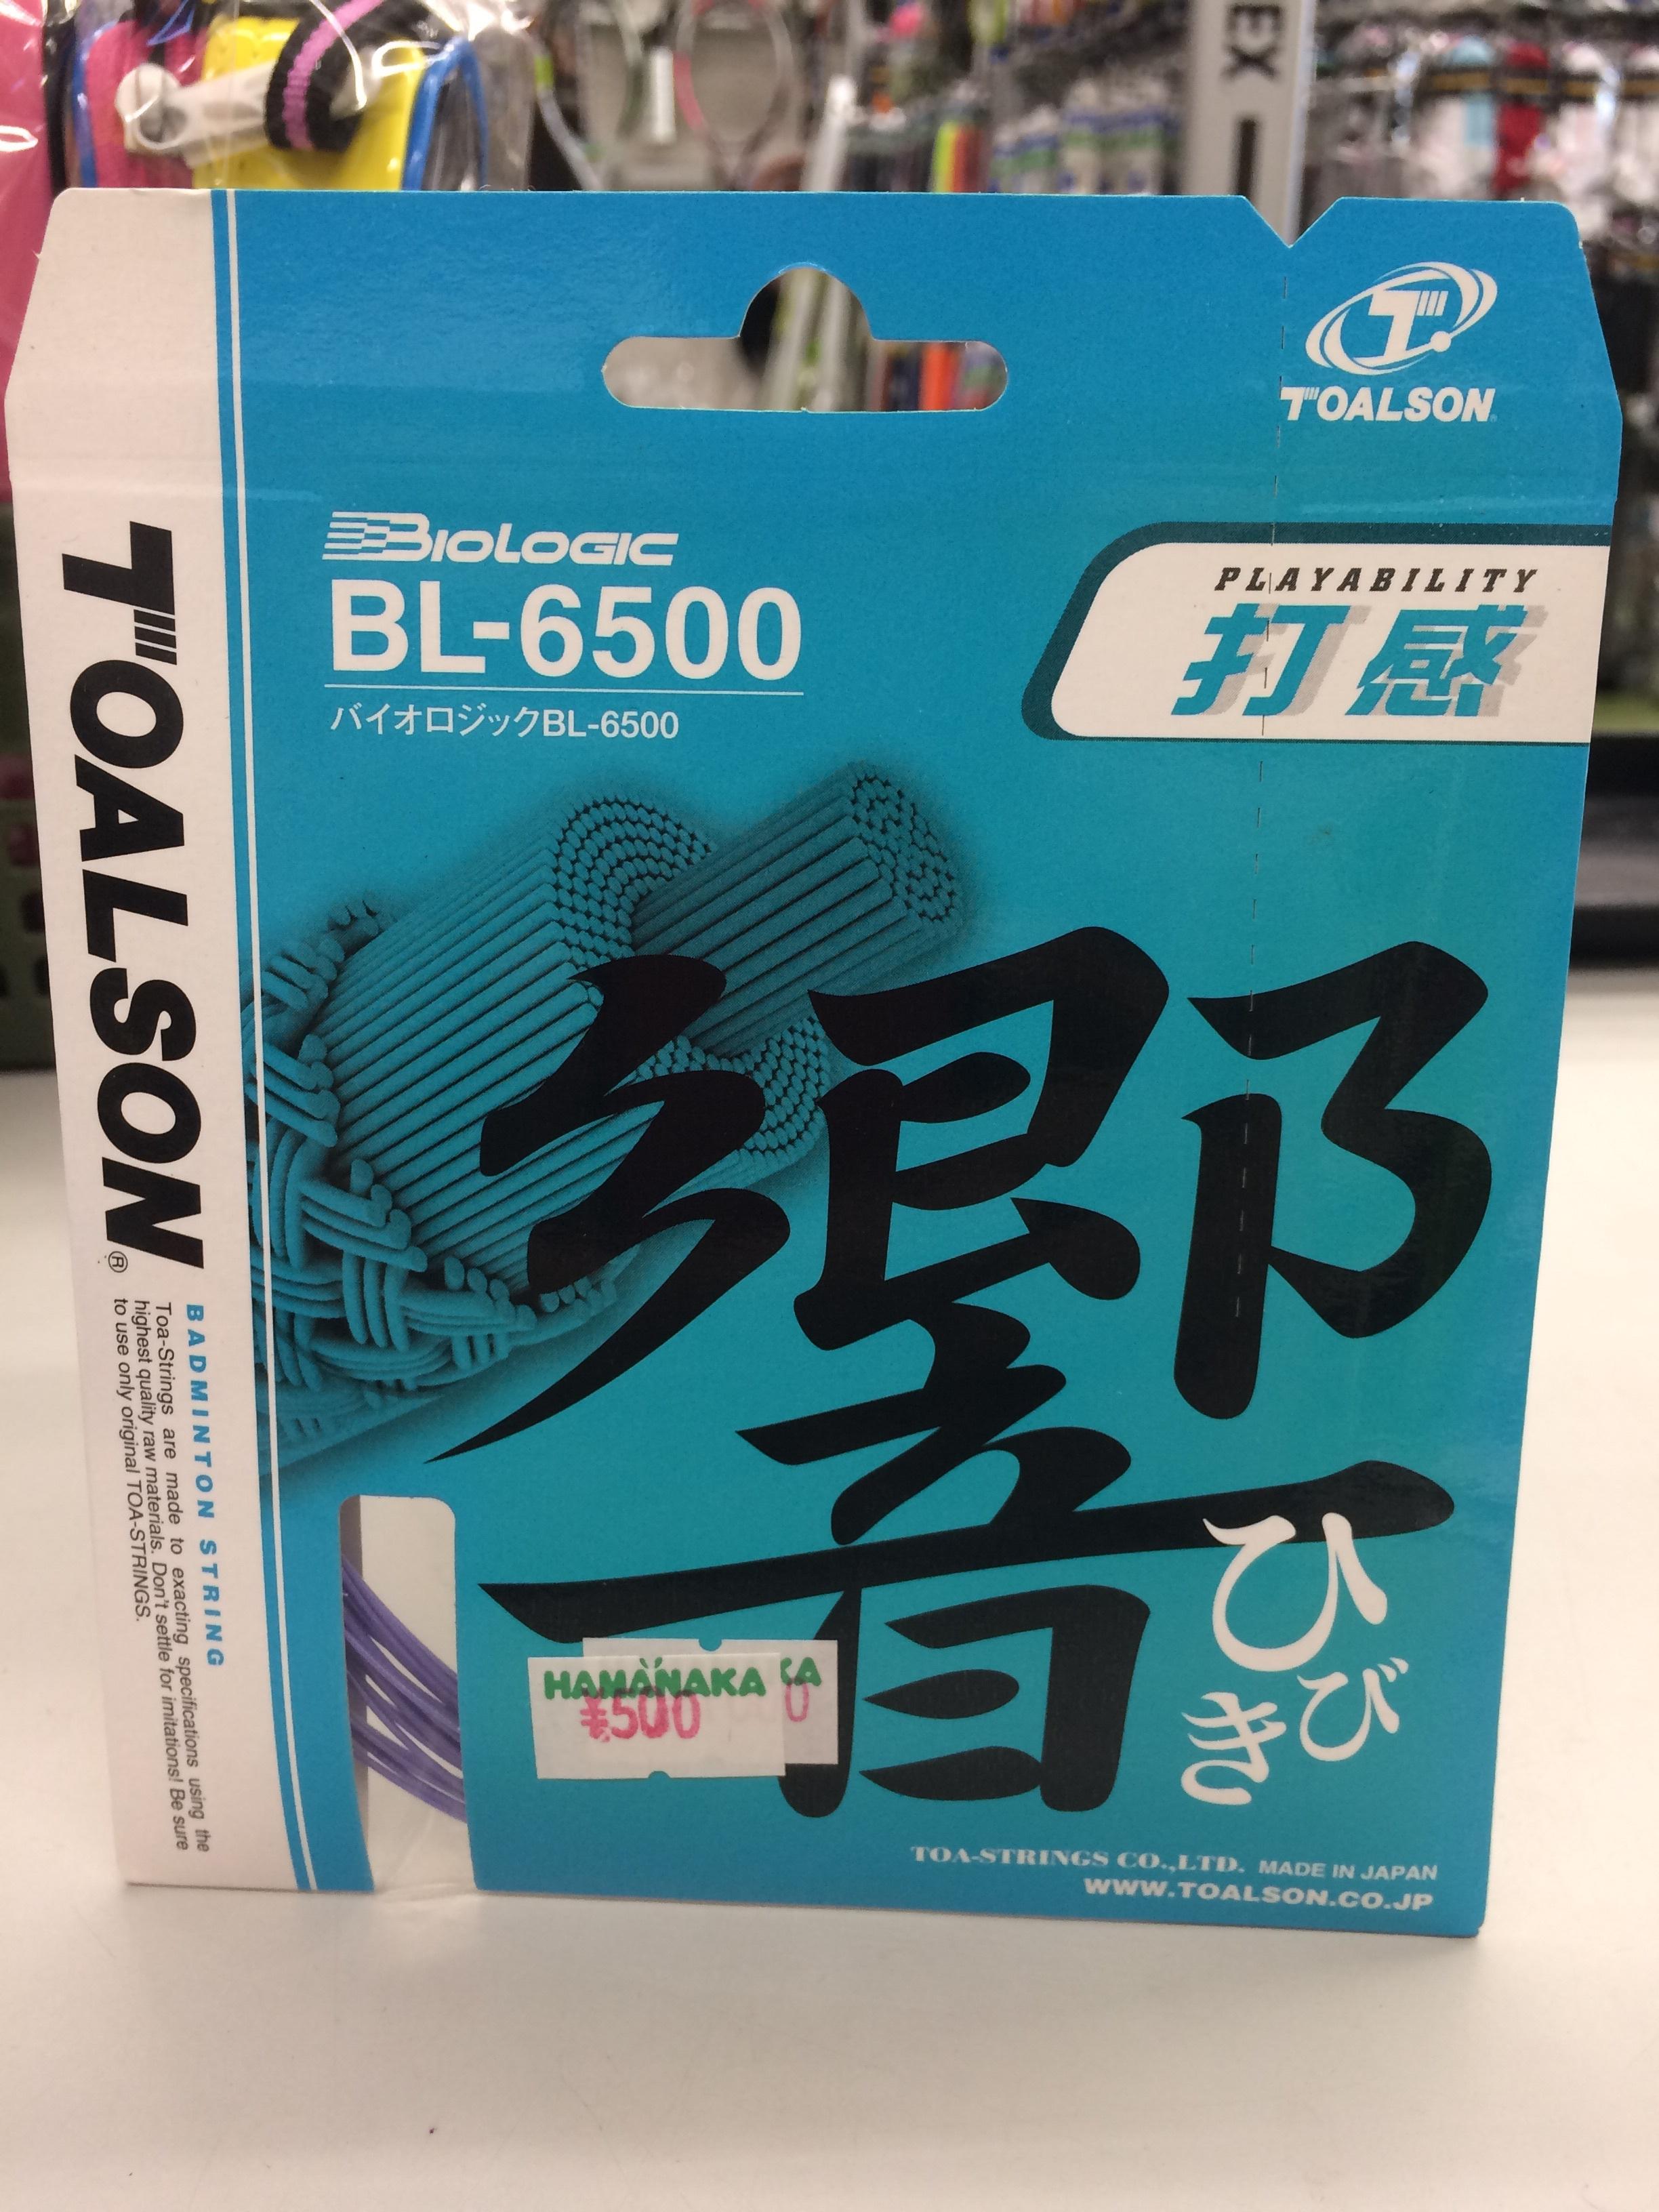 TOALSON  響 BL-6500  - 画像1